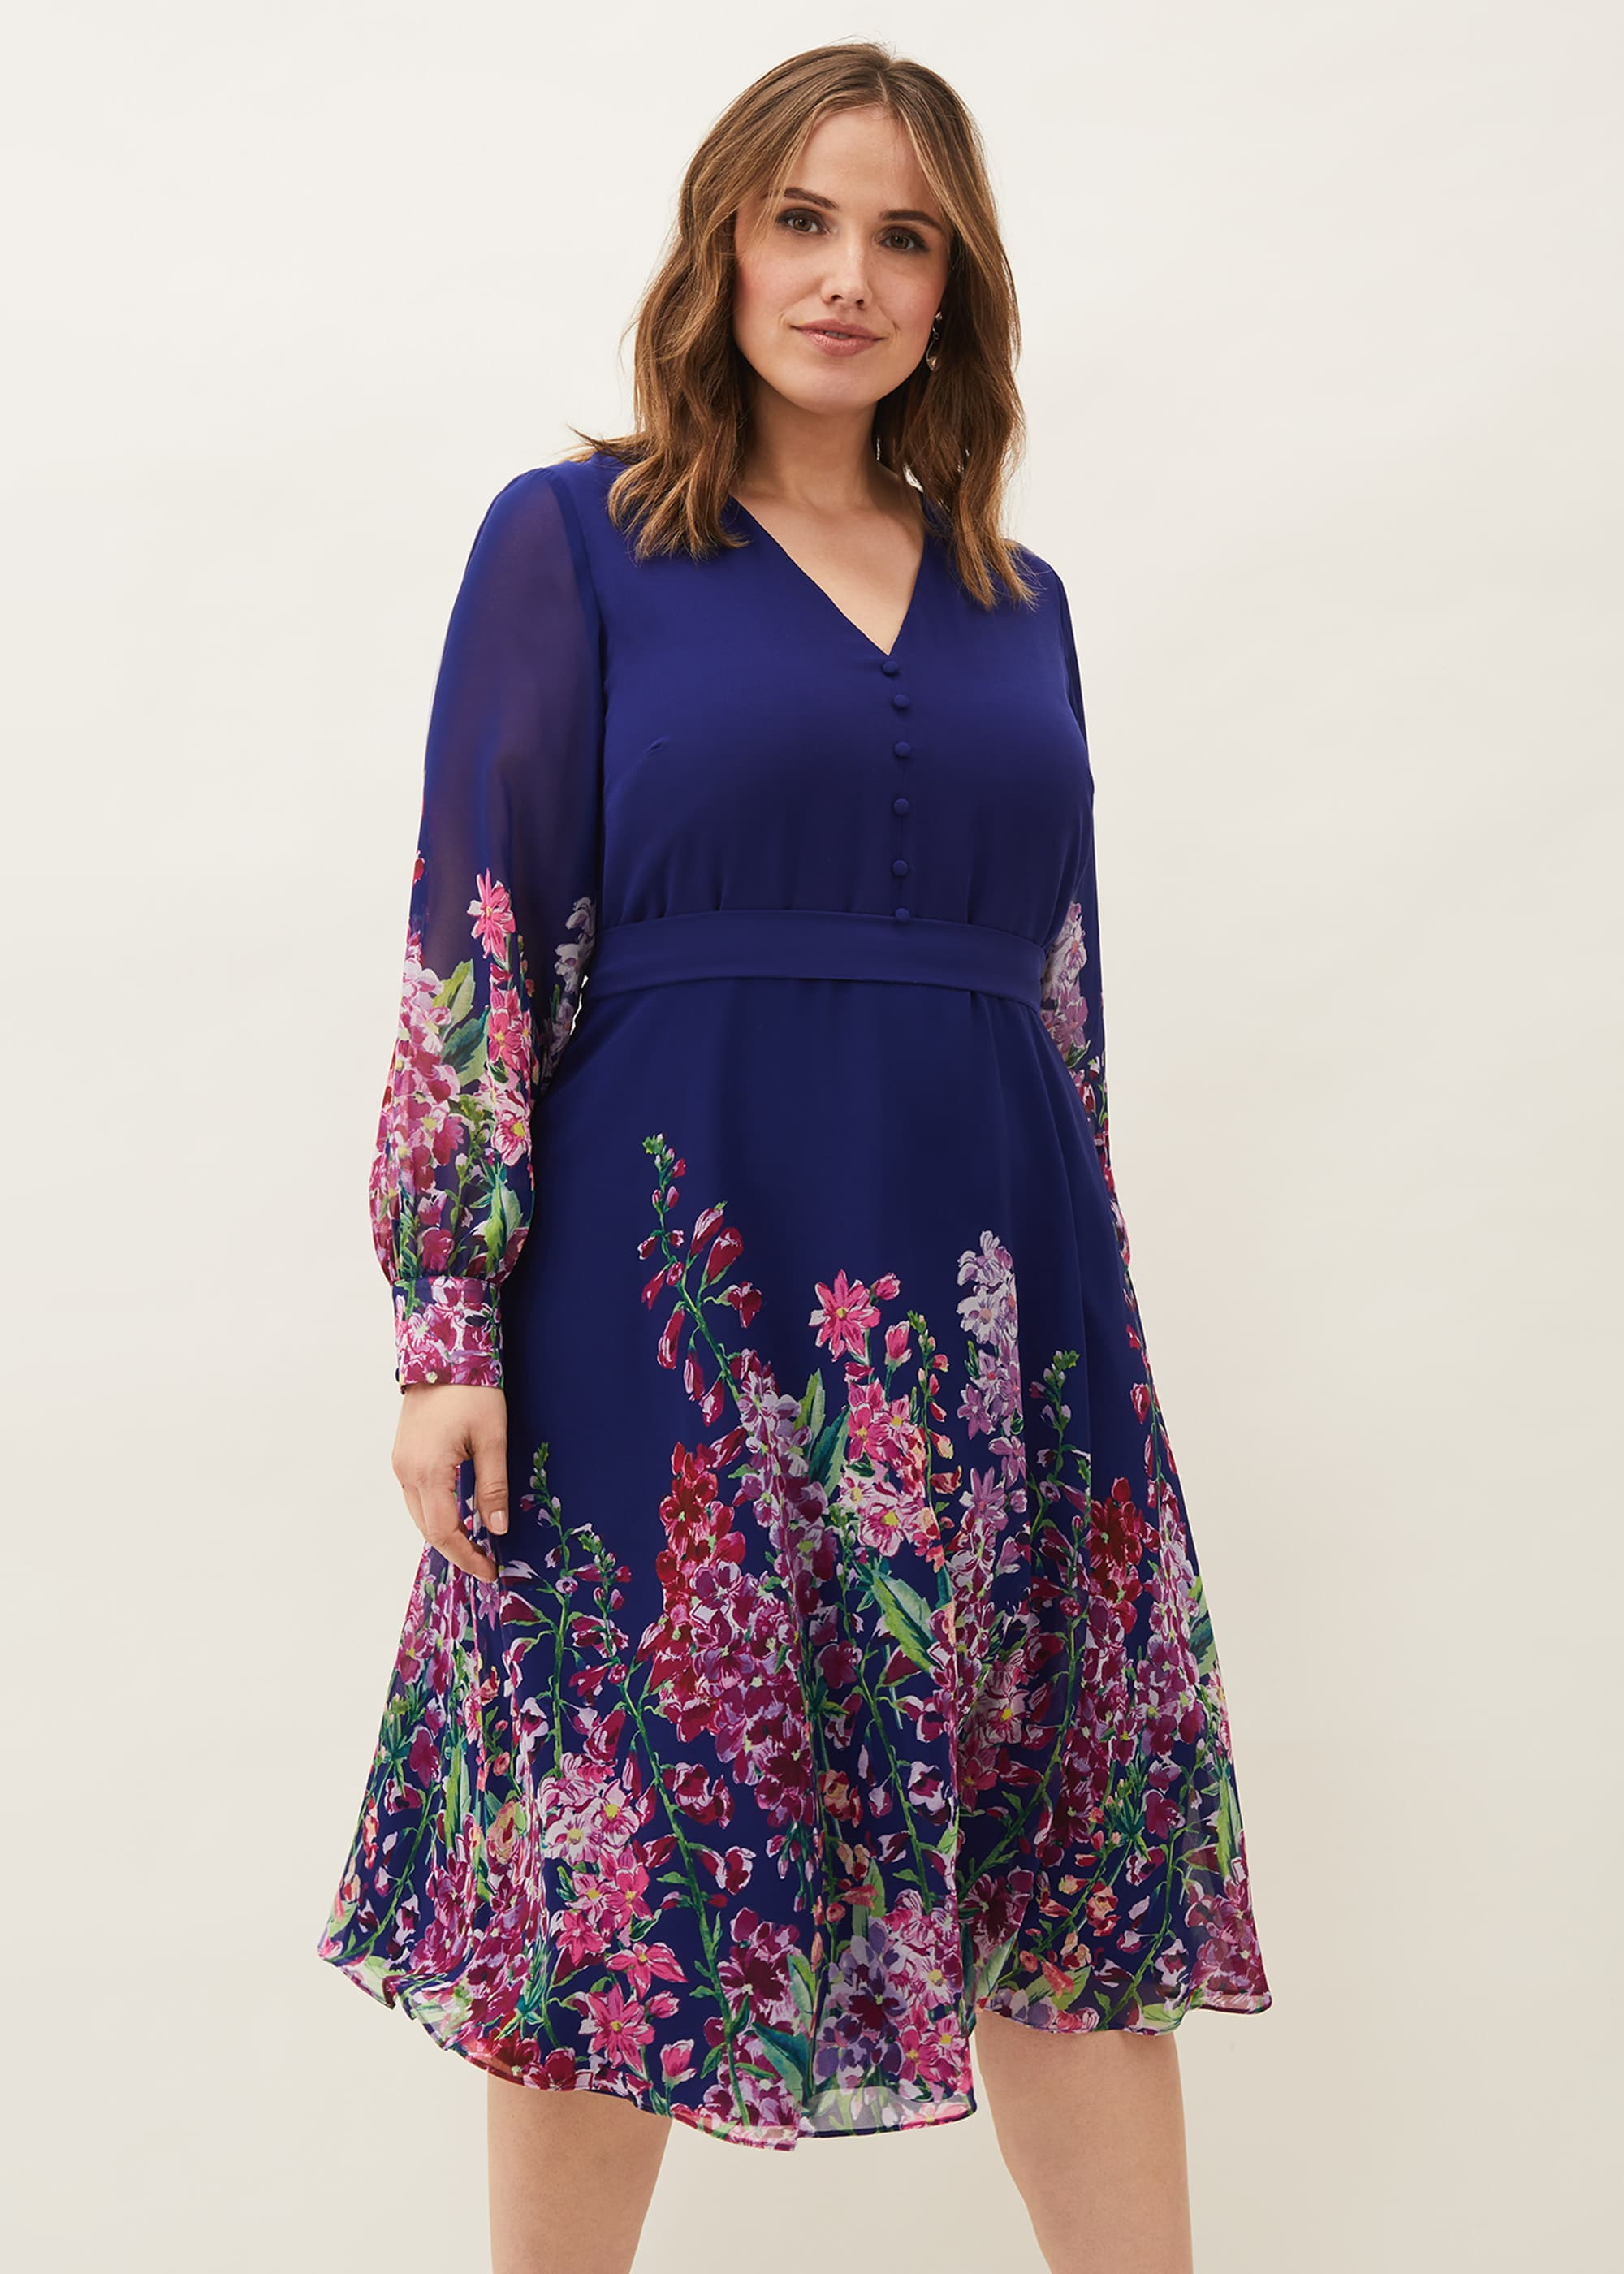 Studio 8 Women Jasmine Floral Dress